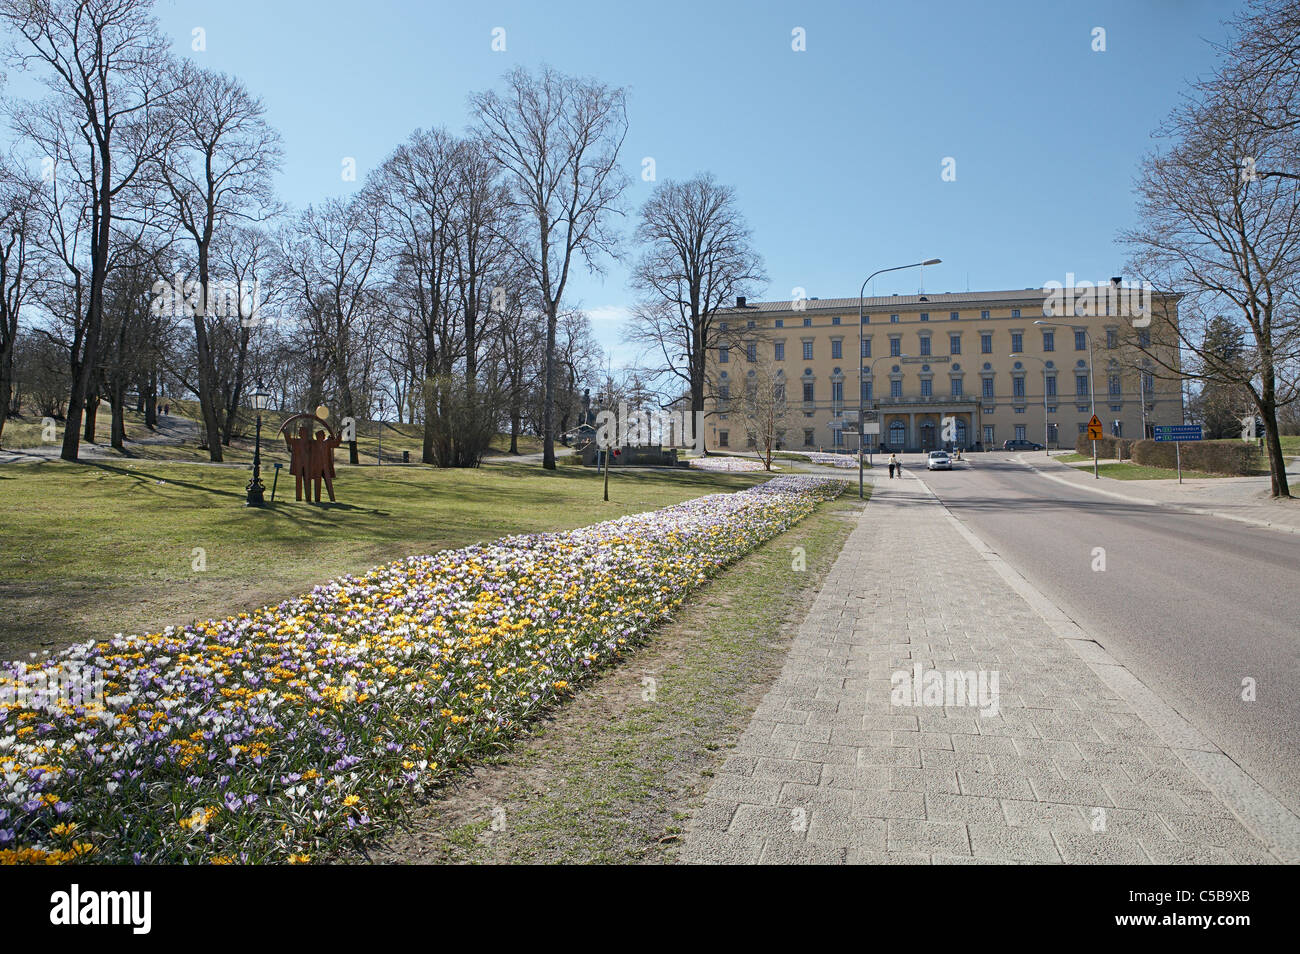 VÃ¥rkrokus flowerbed by the path leading to Carolina Rediviva at Carolina Hill in Uppsala, Sweden Stock Photo